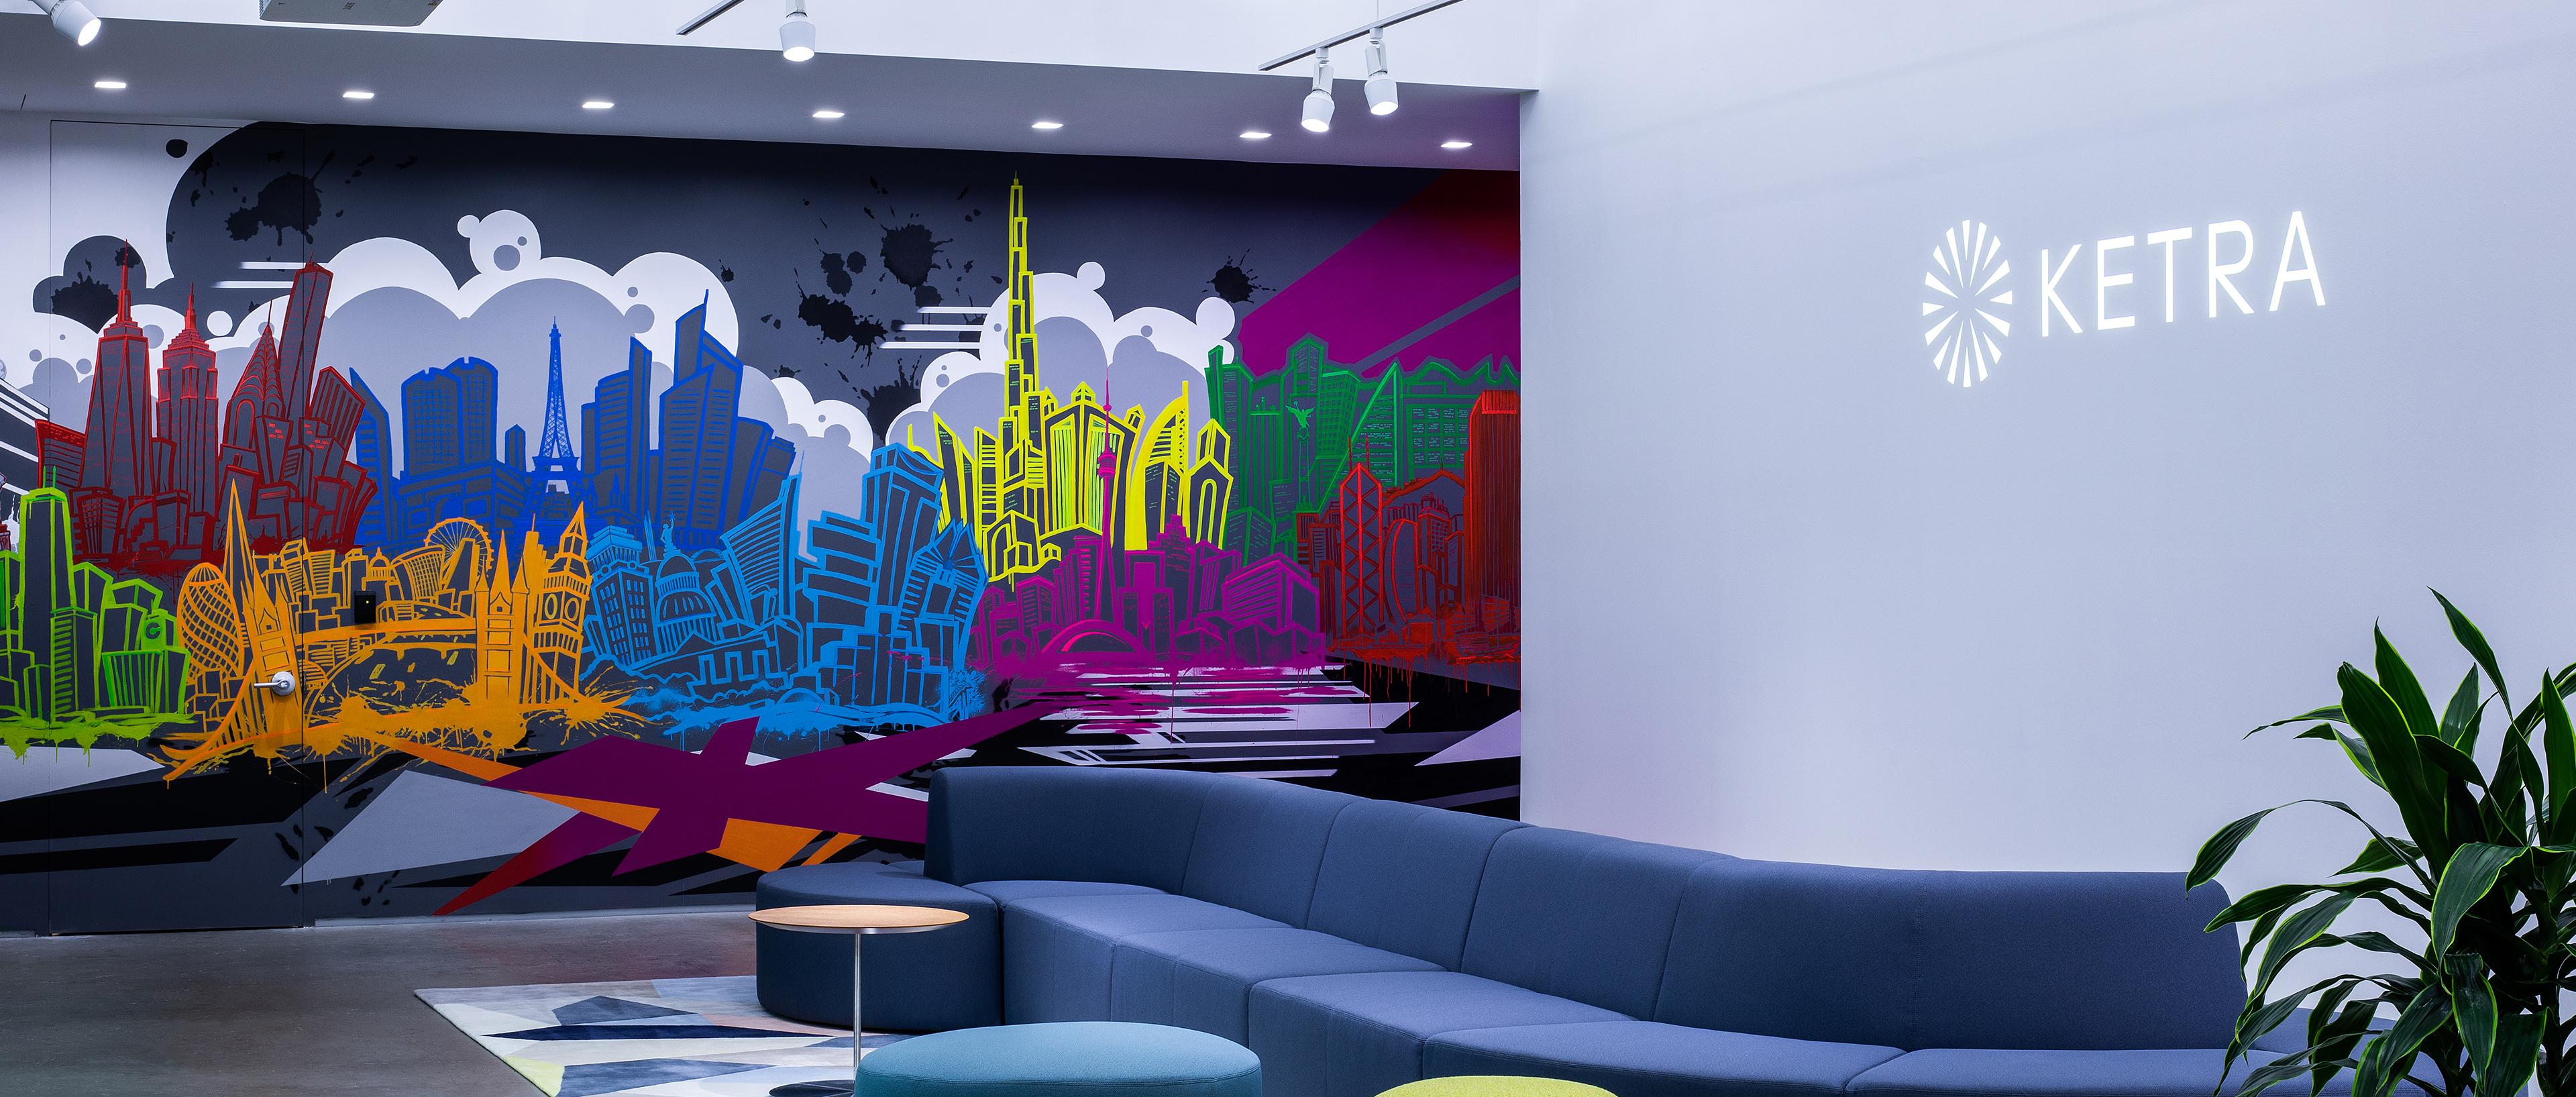 Lobby.collaborationstudio